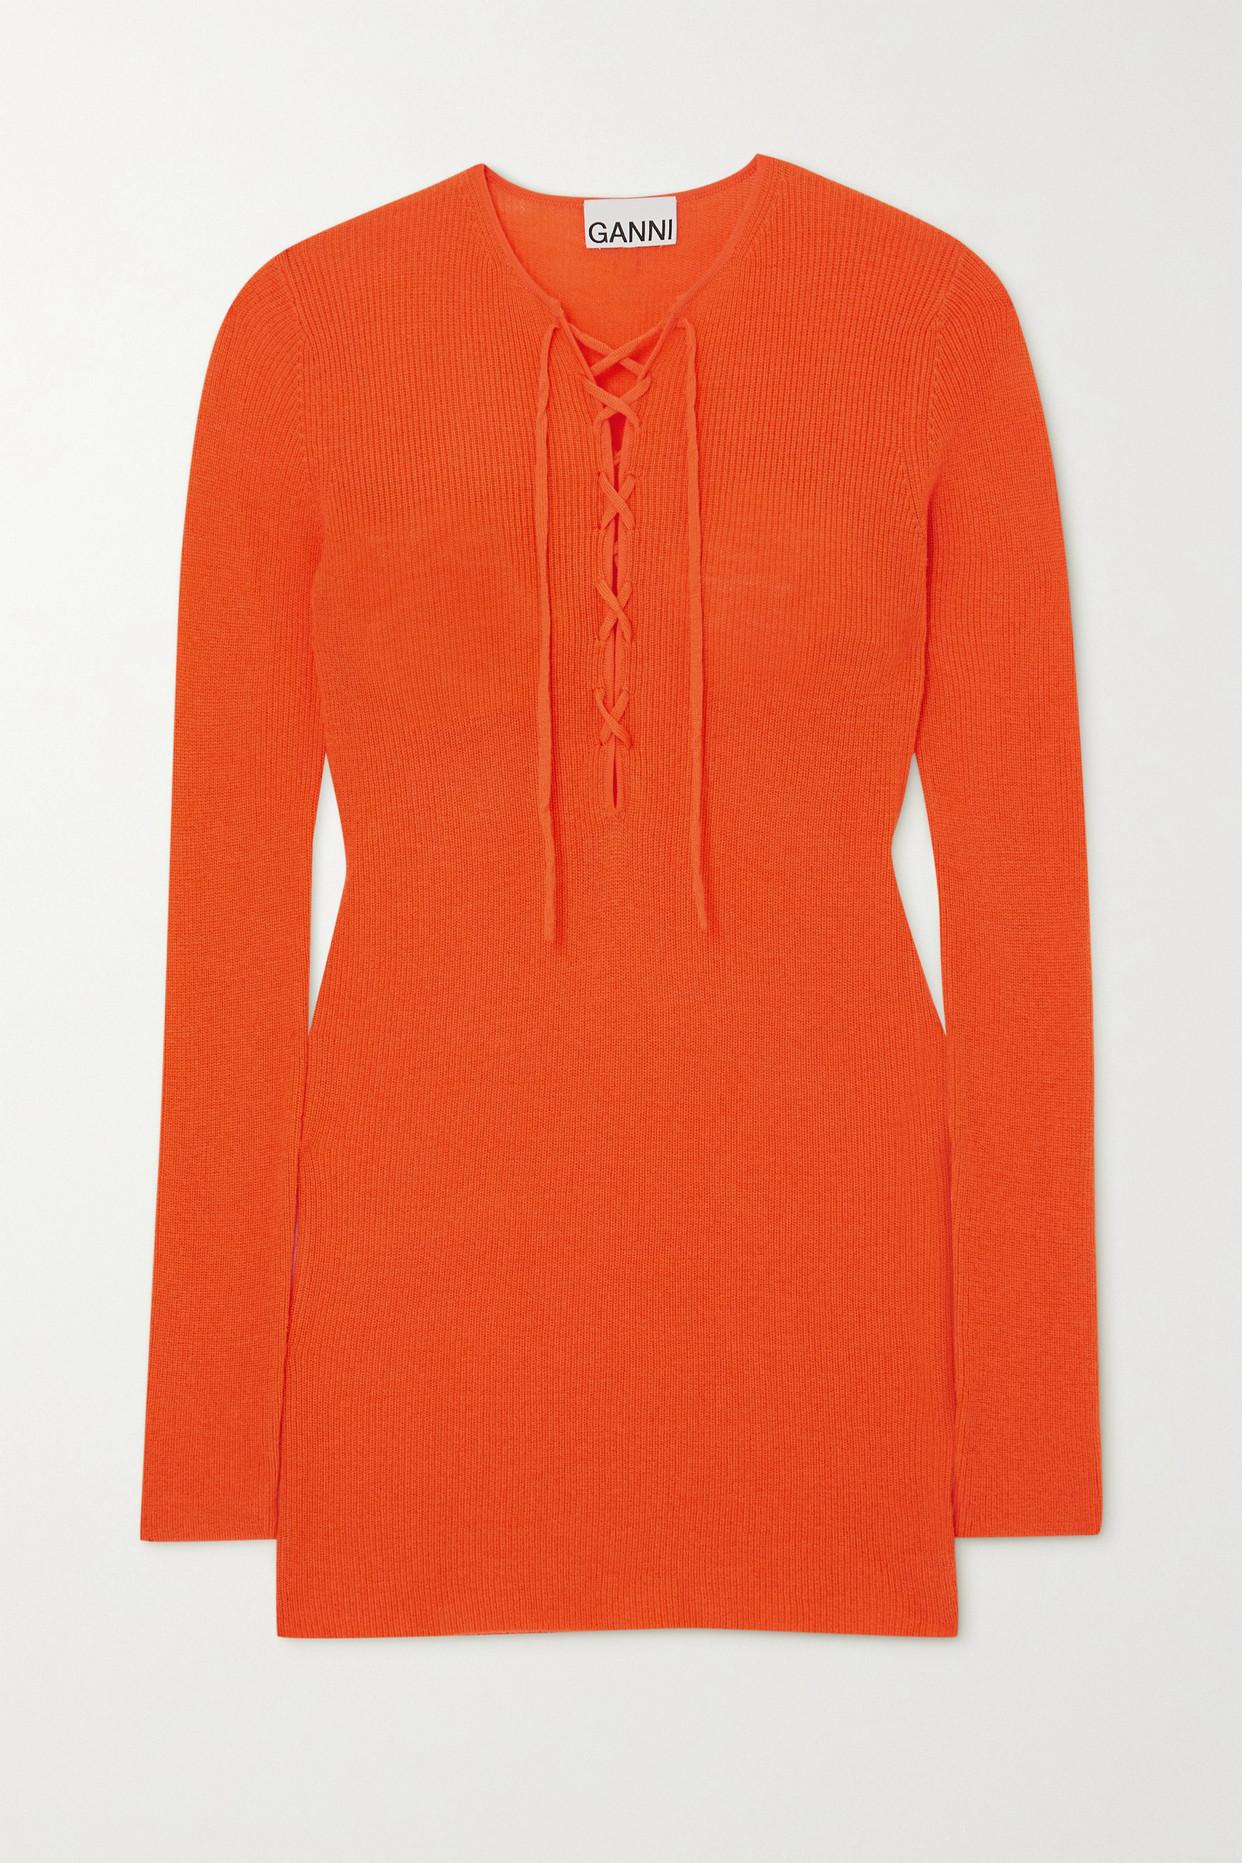 GANNI - 绑带式美利奴羊毛毛衣 - 橙色 - x small